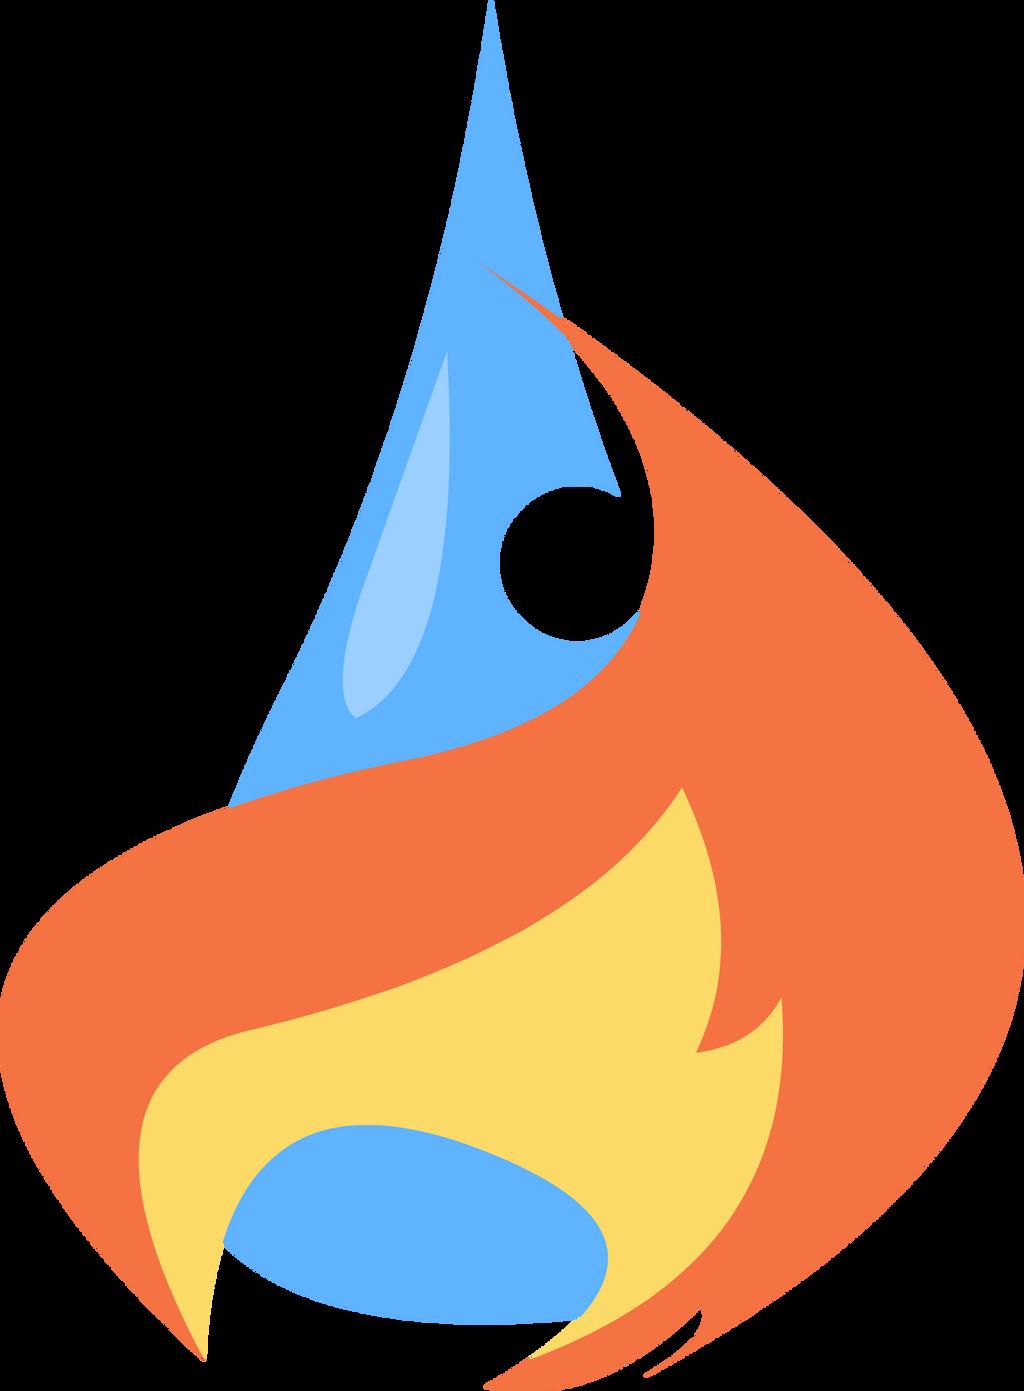 water_flame_s_cutie_mark_by_furrikira-d6